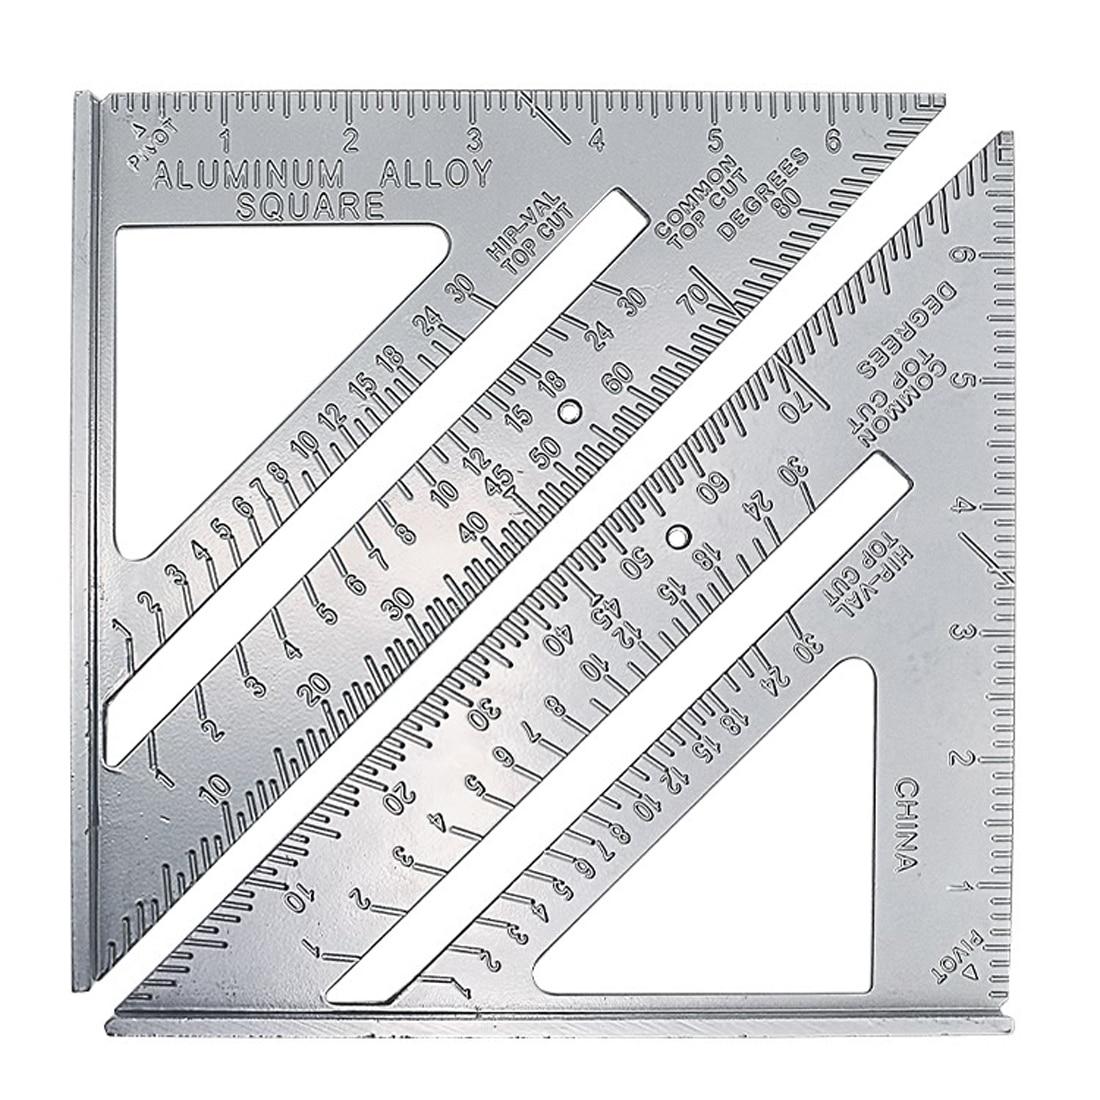 1pcs Triangle Square Protractor Aluminum Alloy Carpenter Ruler Speed Miter Framing Tri-square Line Scriber Saw Guide Measurement